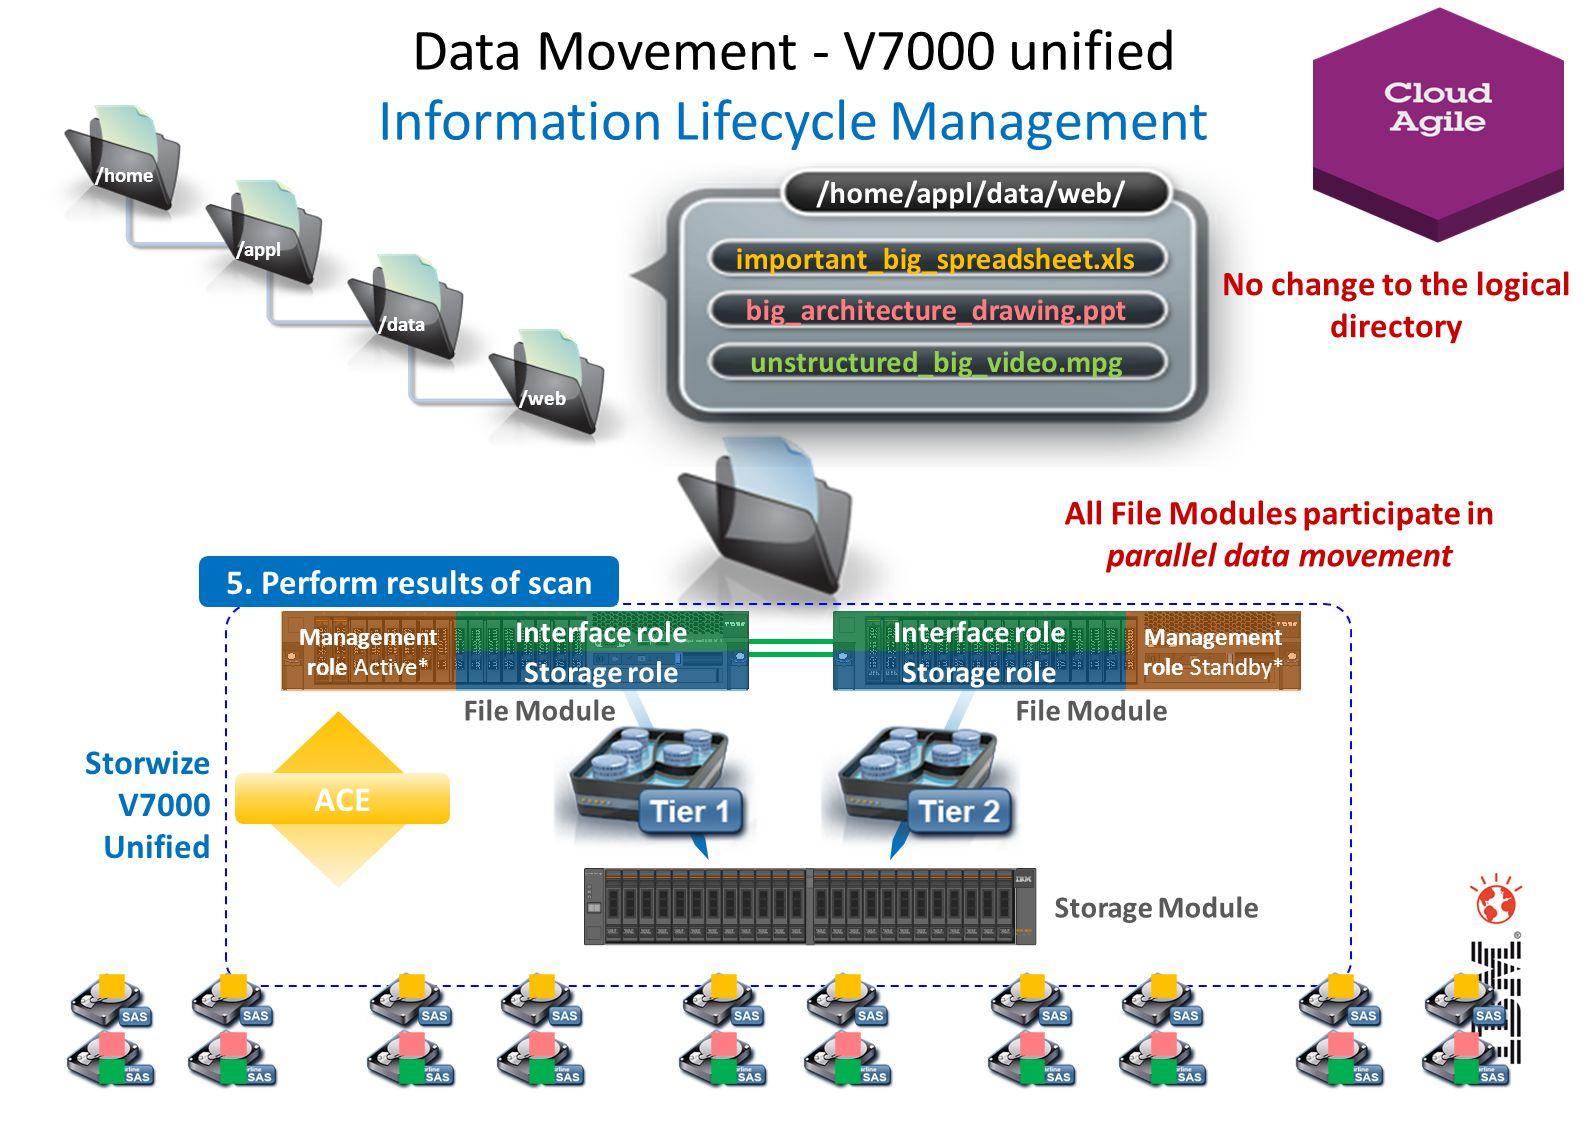 Management role Active* Storage role Interface role Management role Standby* Storage role Interface role Storage Module File Module ACE Storwize V7000